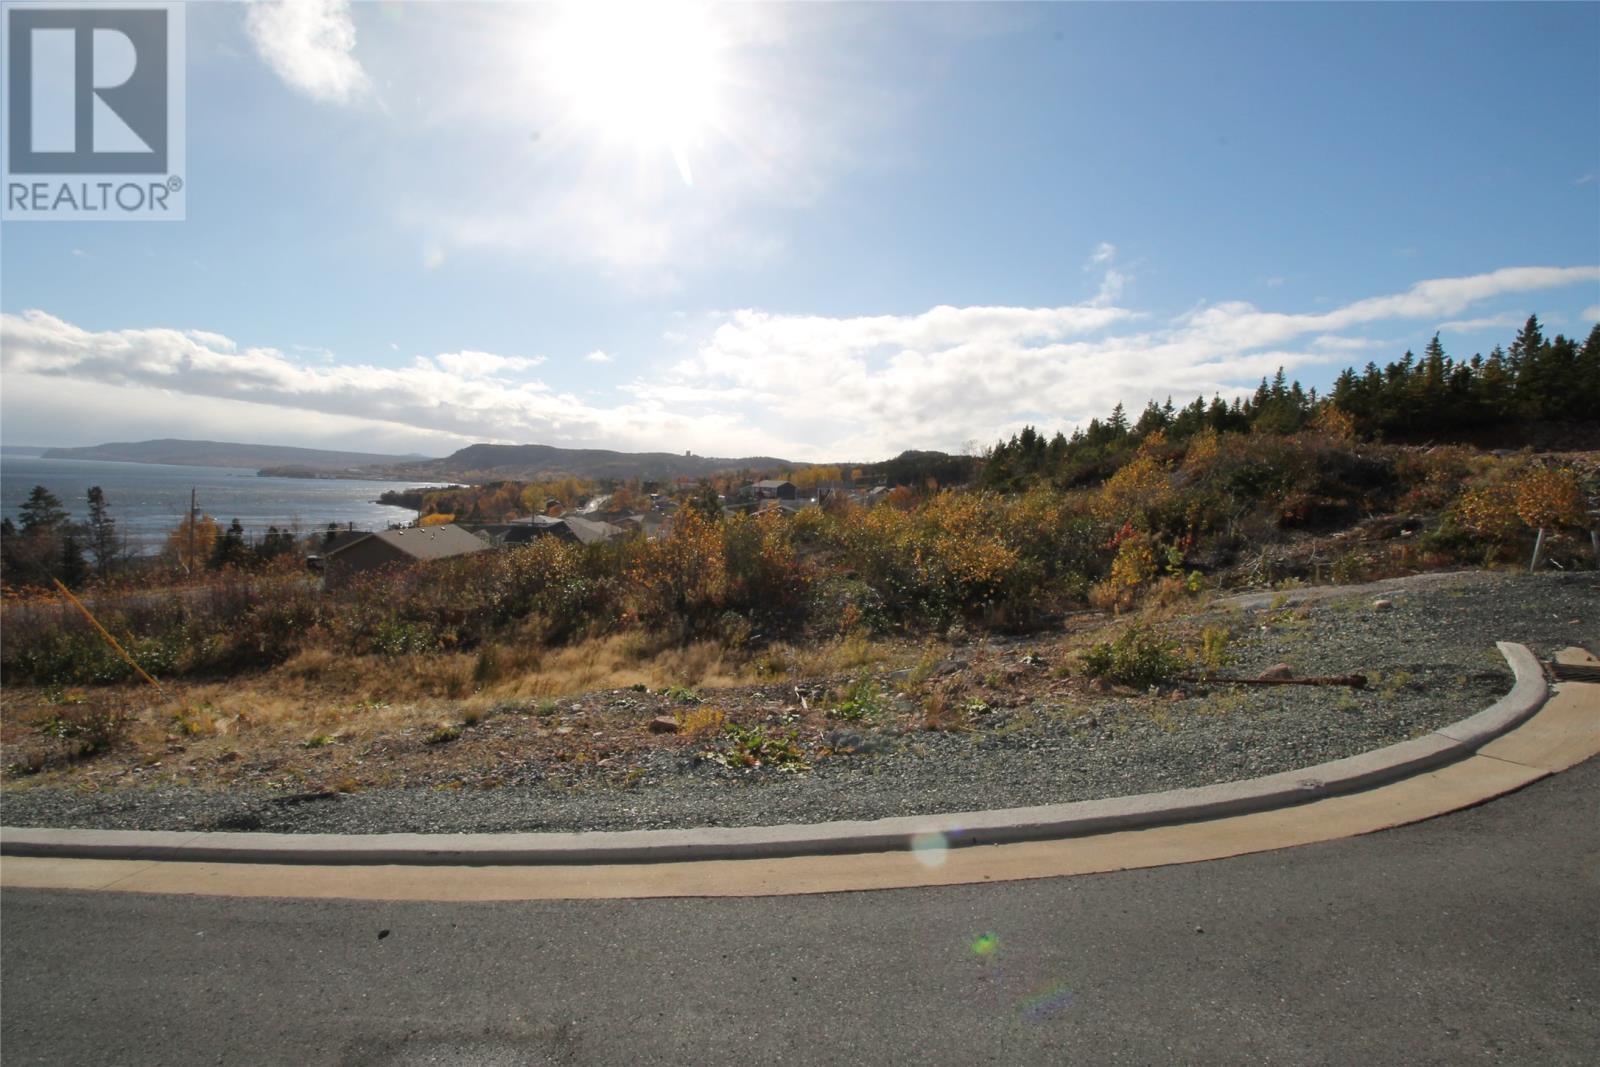 Lot 7 Ridgewood Crescent, Clarenville, Newfoundland & Labrador  A5A 0G3 - Photo 2 - 1186862